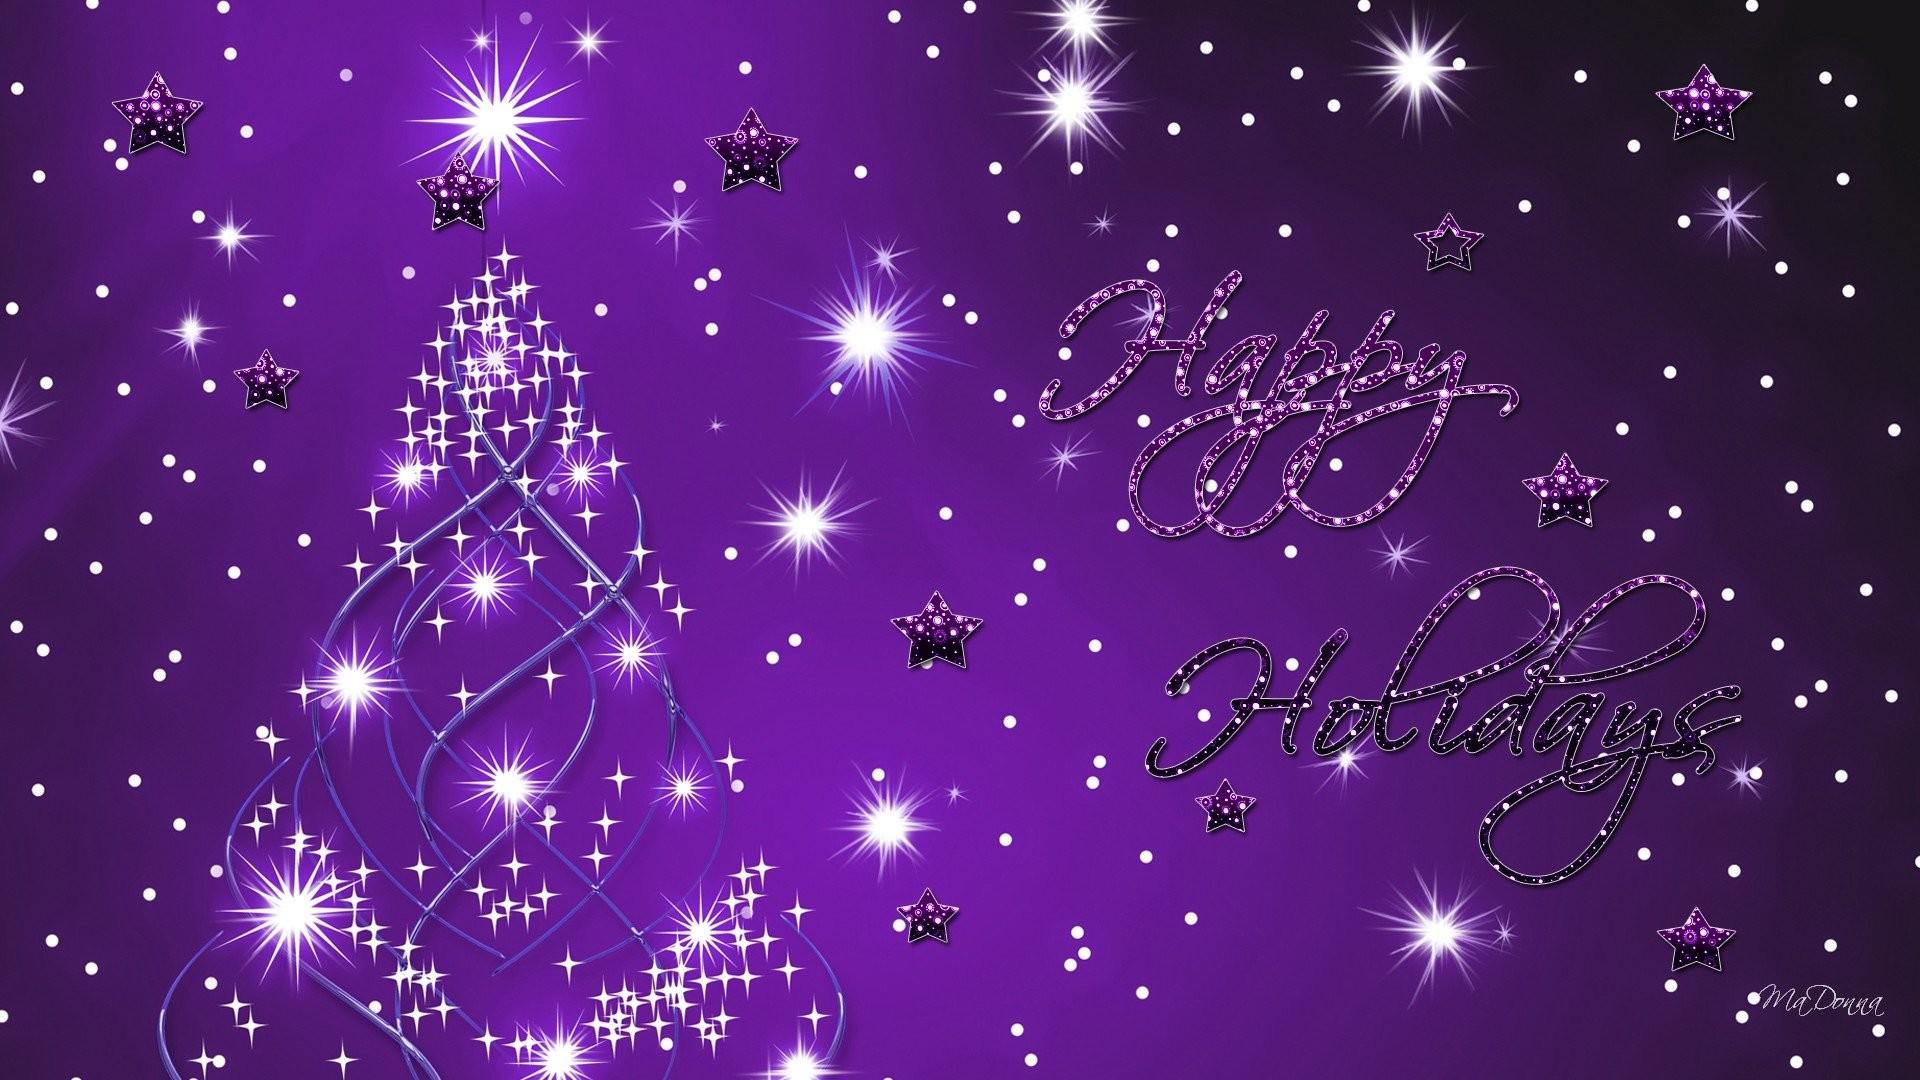 Res: 1920x1080, Happy Holidays HD desktop wallpaper : Widescreen : High Definition